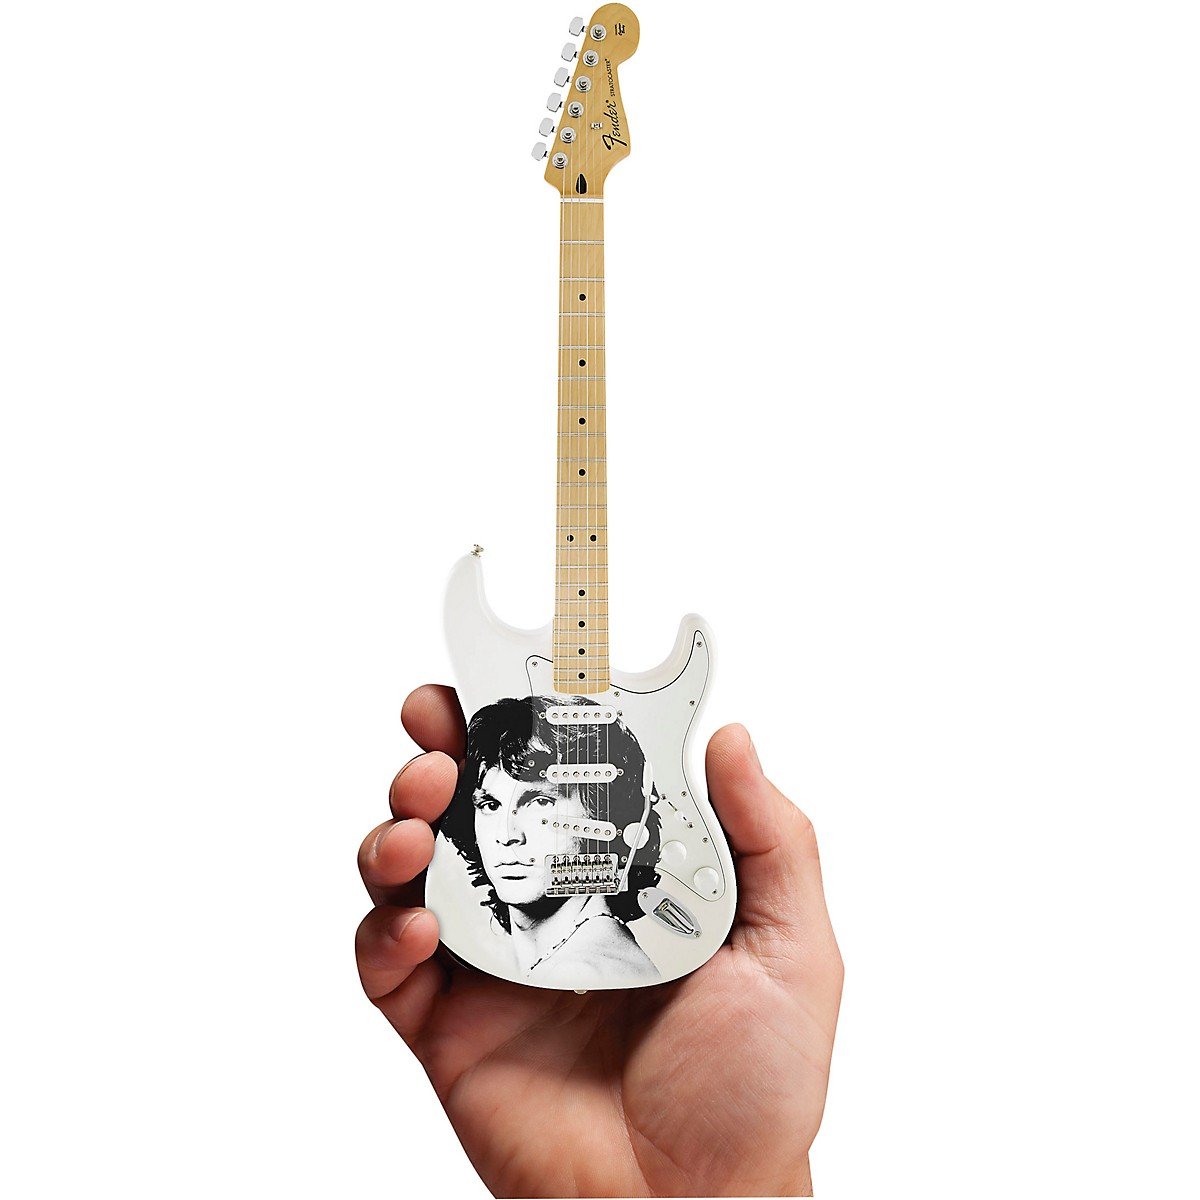 Axe Heaven Jim Morrison Tribute Fender Stratocaster Officially Licensed Miniature Guitar Replica